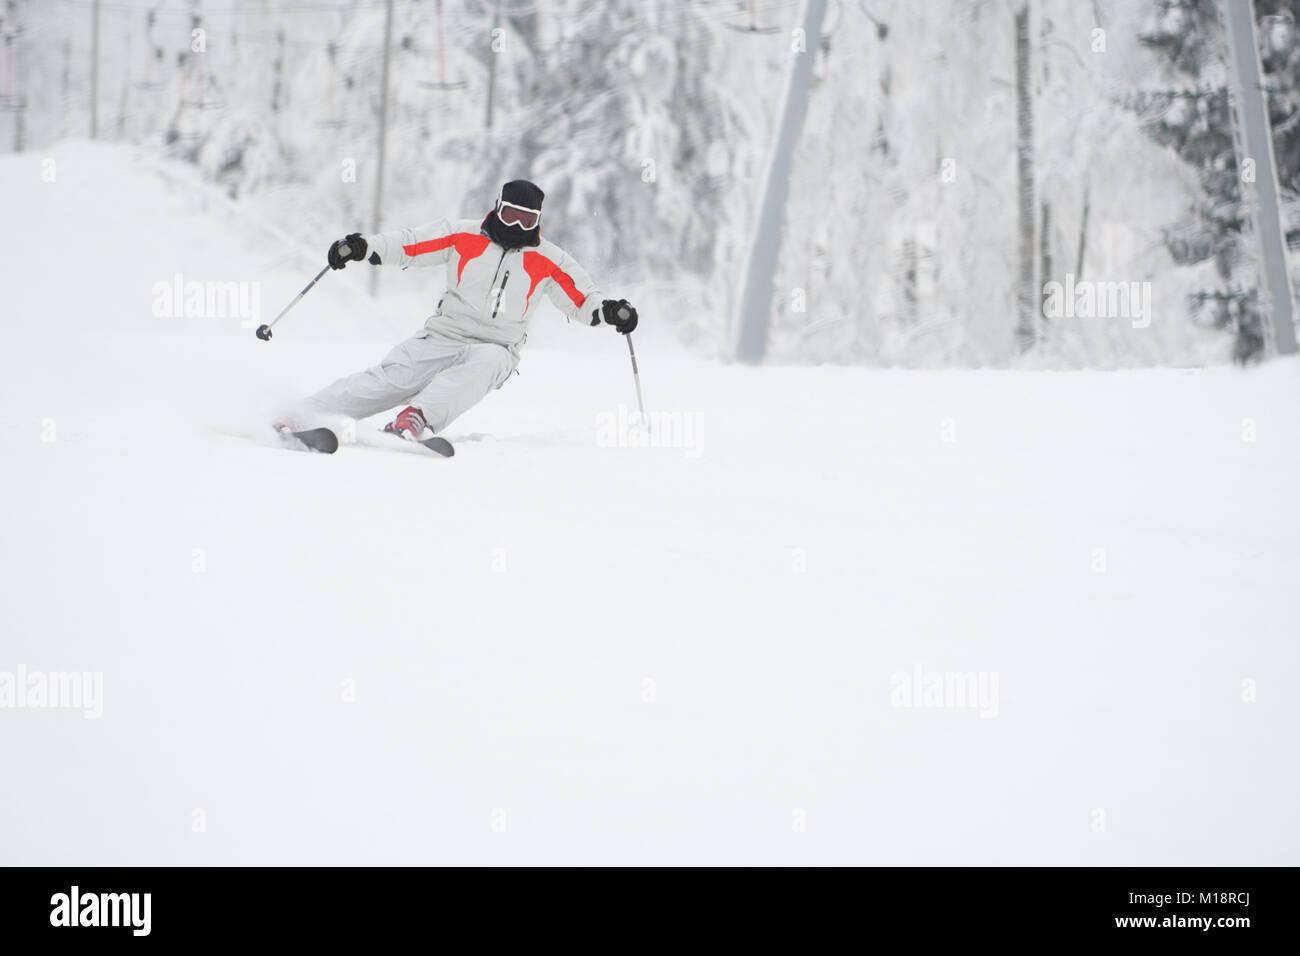 Alpine skier skiing downhill over white snow background - Stock Image